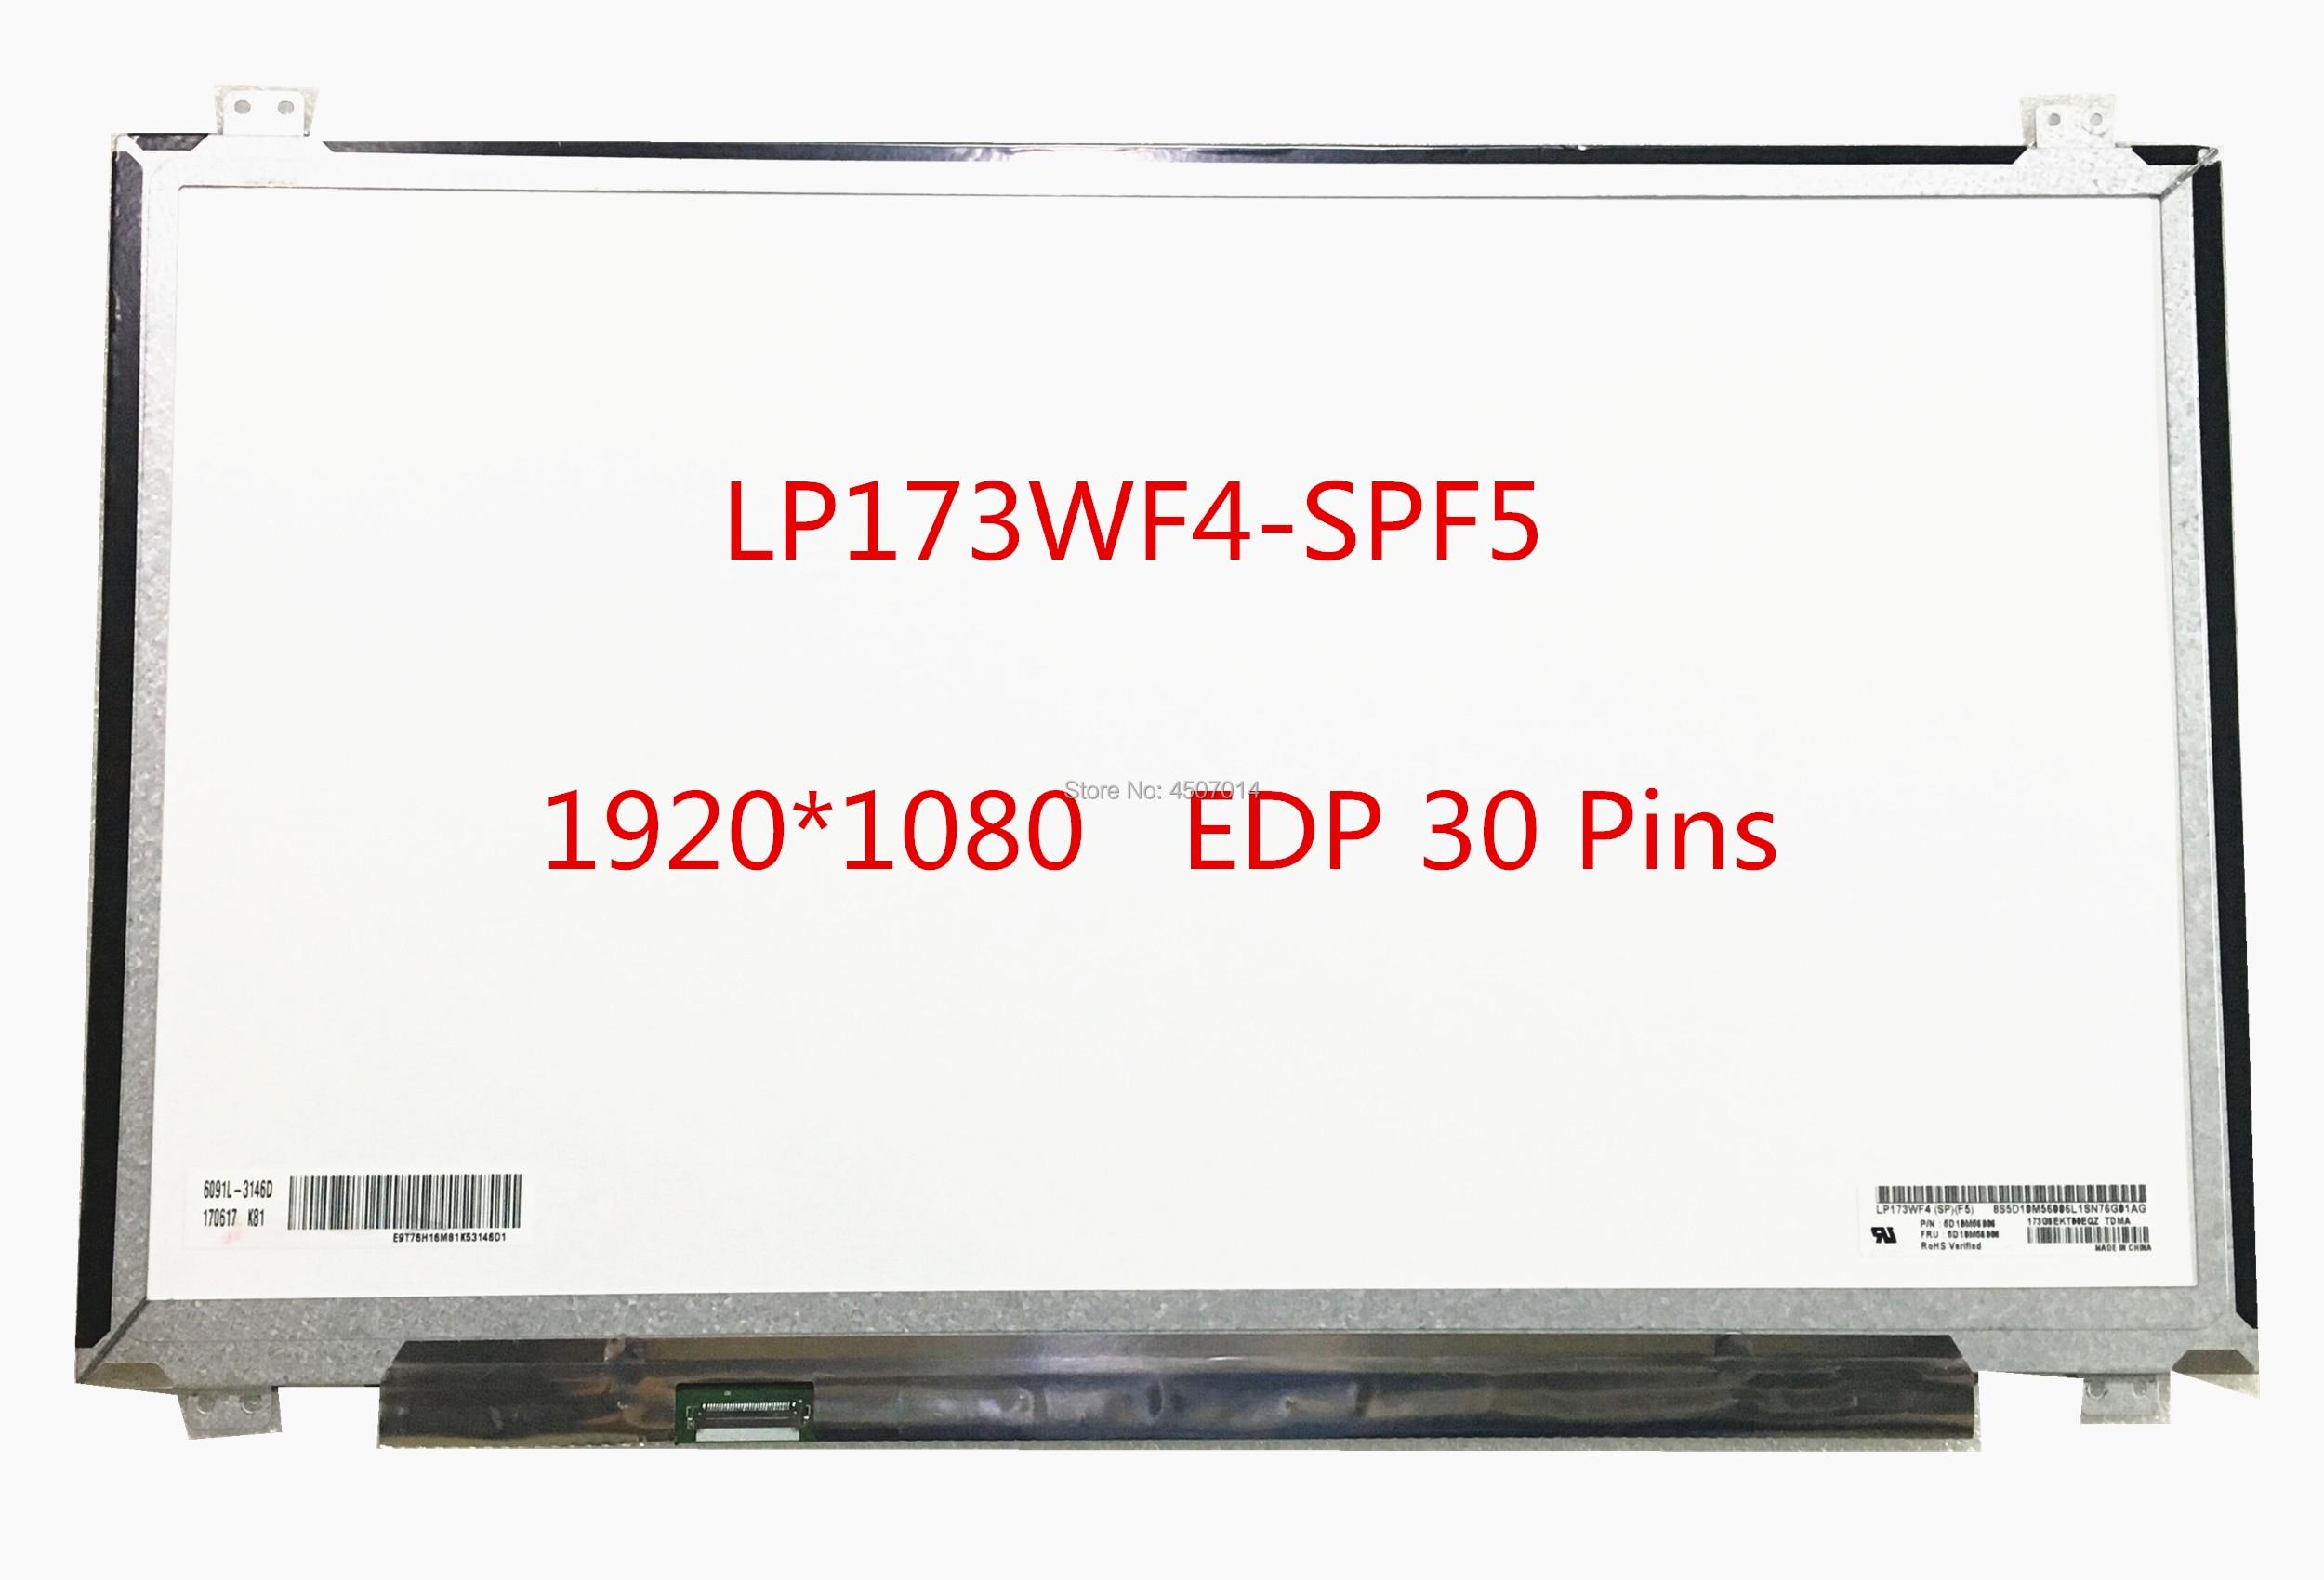 Free shipping LP173WF4-SPF5 LP173WF4 SPF5 LP173WF4 SPF3 SPF2 LTN173HL01-401 N173HCE-E31 B173HAN01.0 B173HAN01.1 1920*1080 IPS